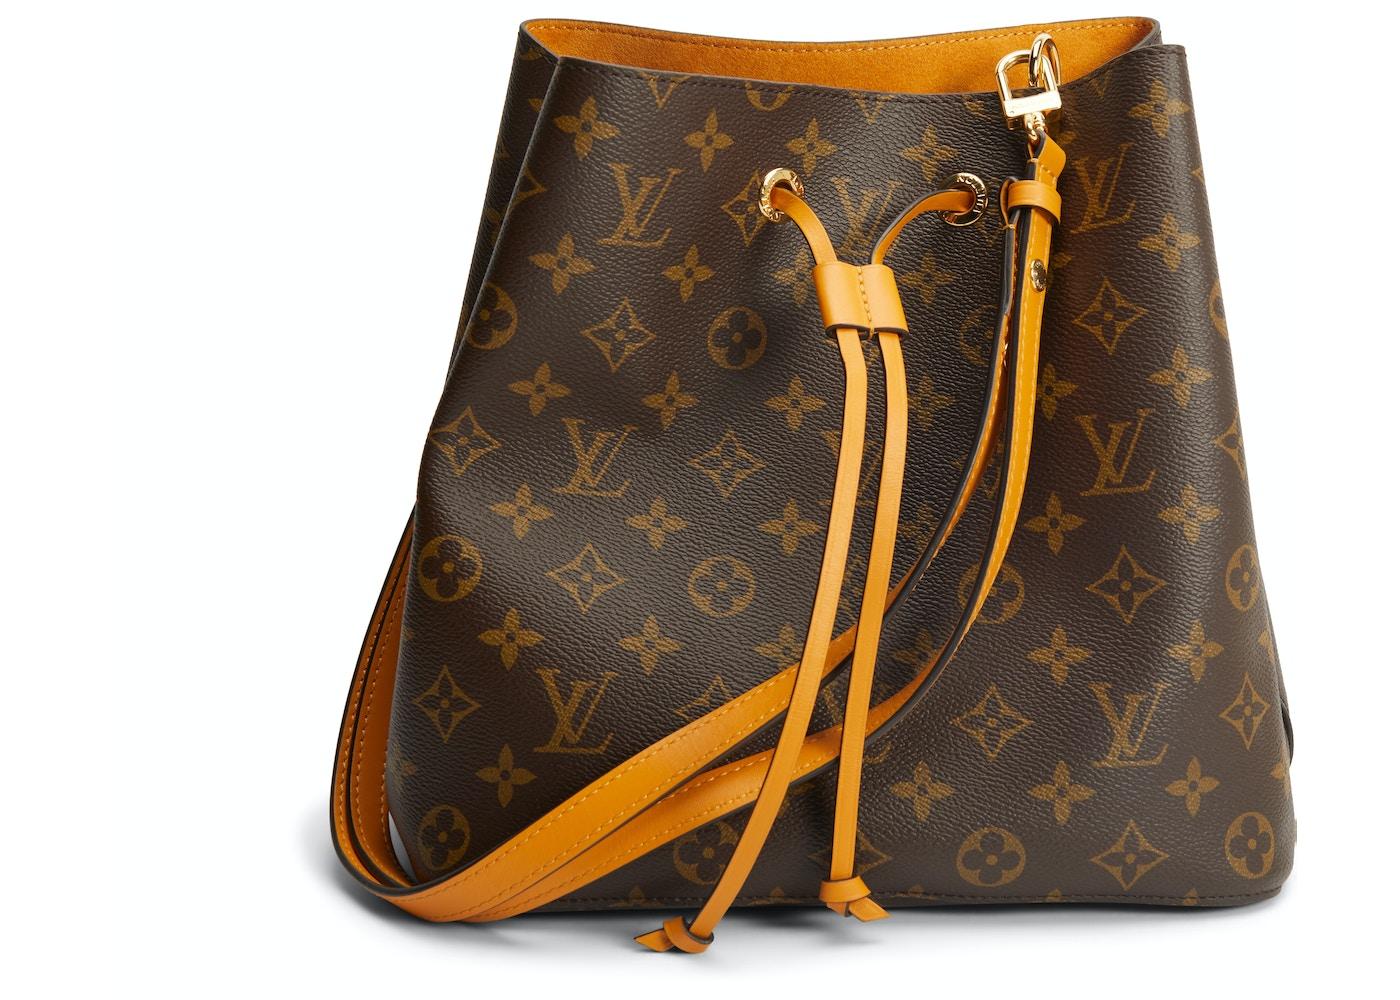 fd29f2aa57ac Buy   Sell Louis Vuitton Noe Handbags - Total Sold